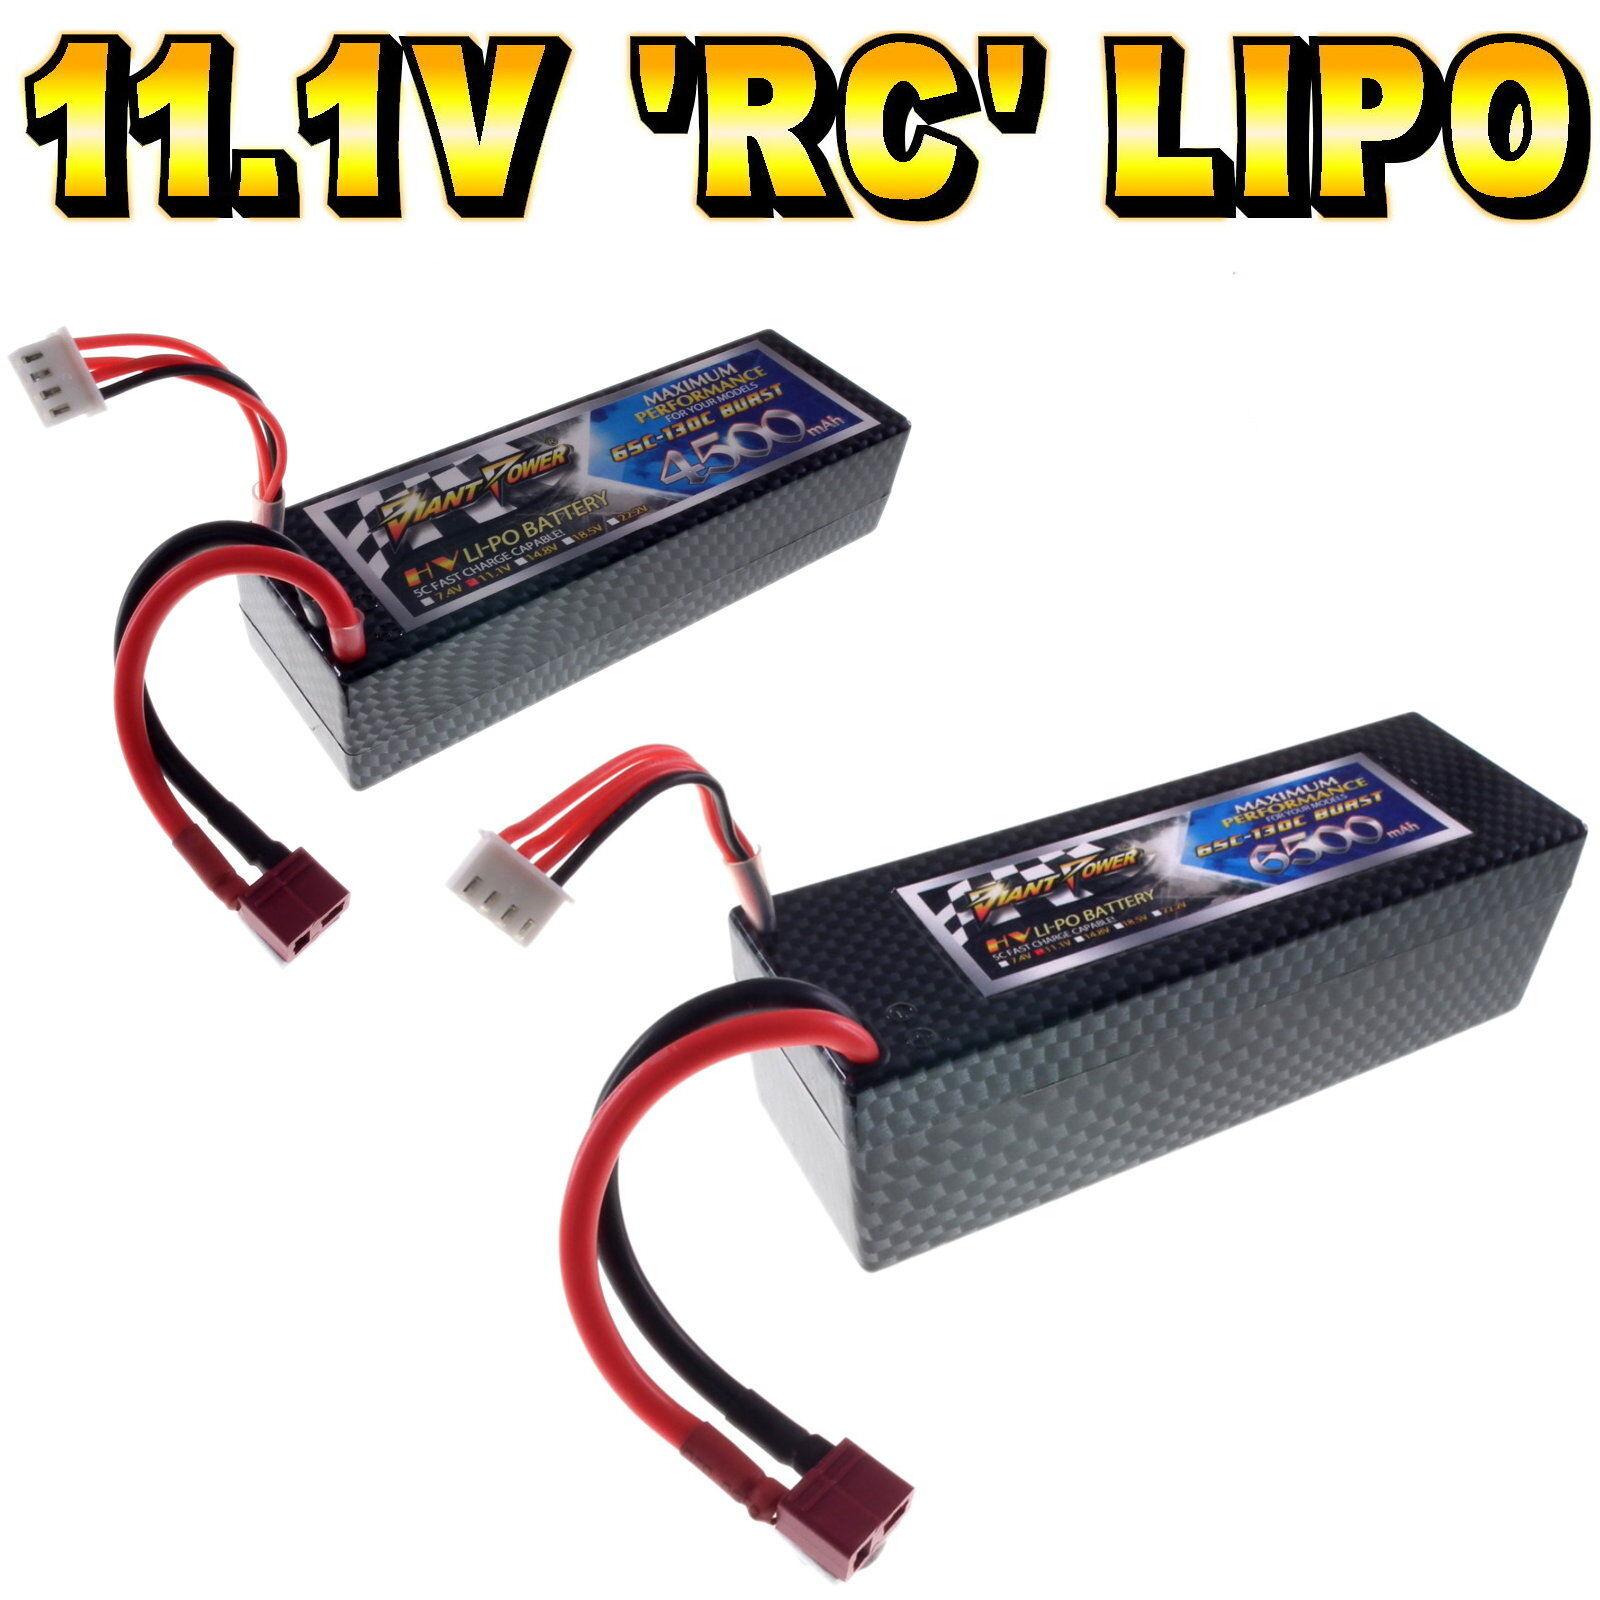 11 1V 4500mAh 6500mAh 3s LiPo Hard Case RC Car Battery 65 130C